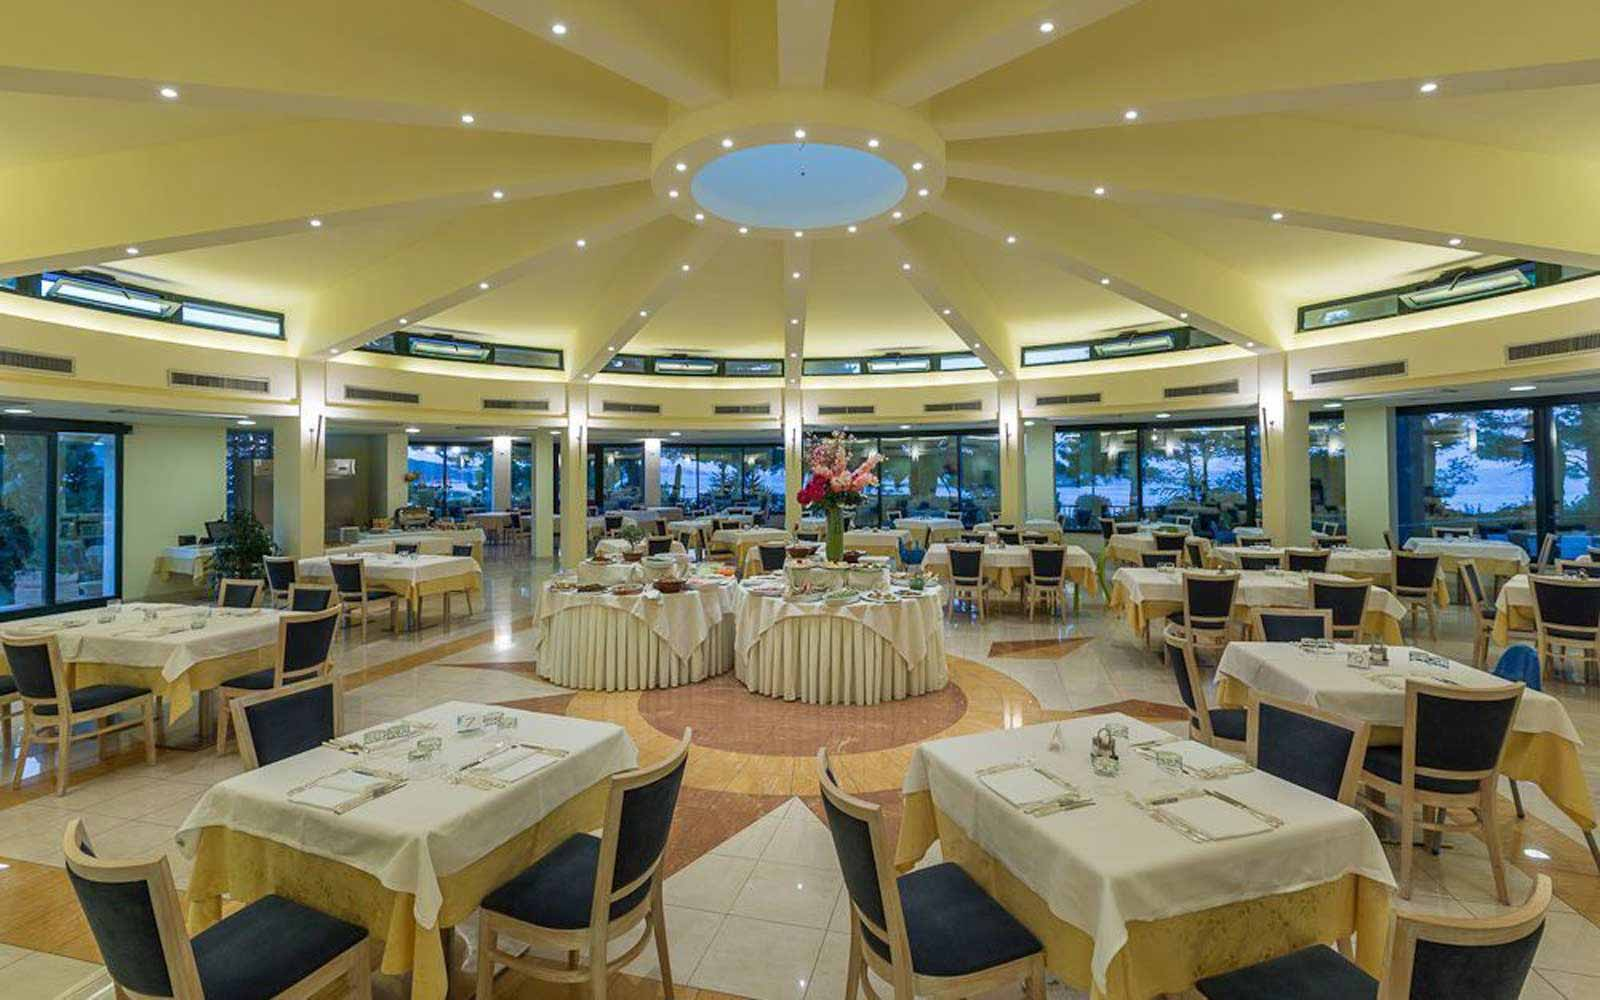 The Orcio restaurant at the Gattarella Resort